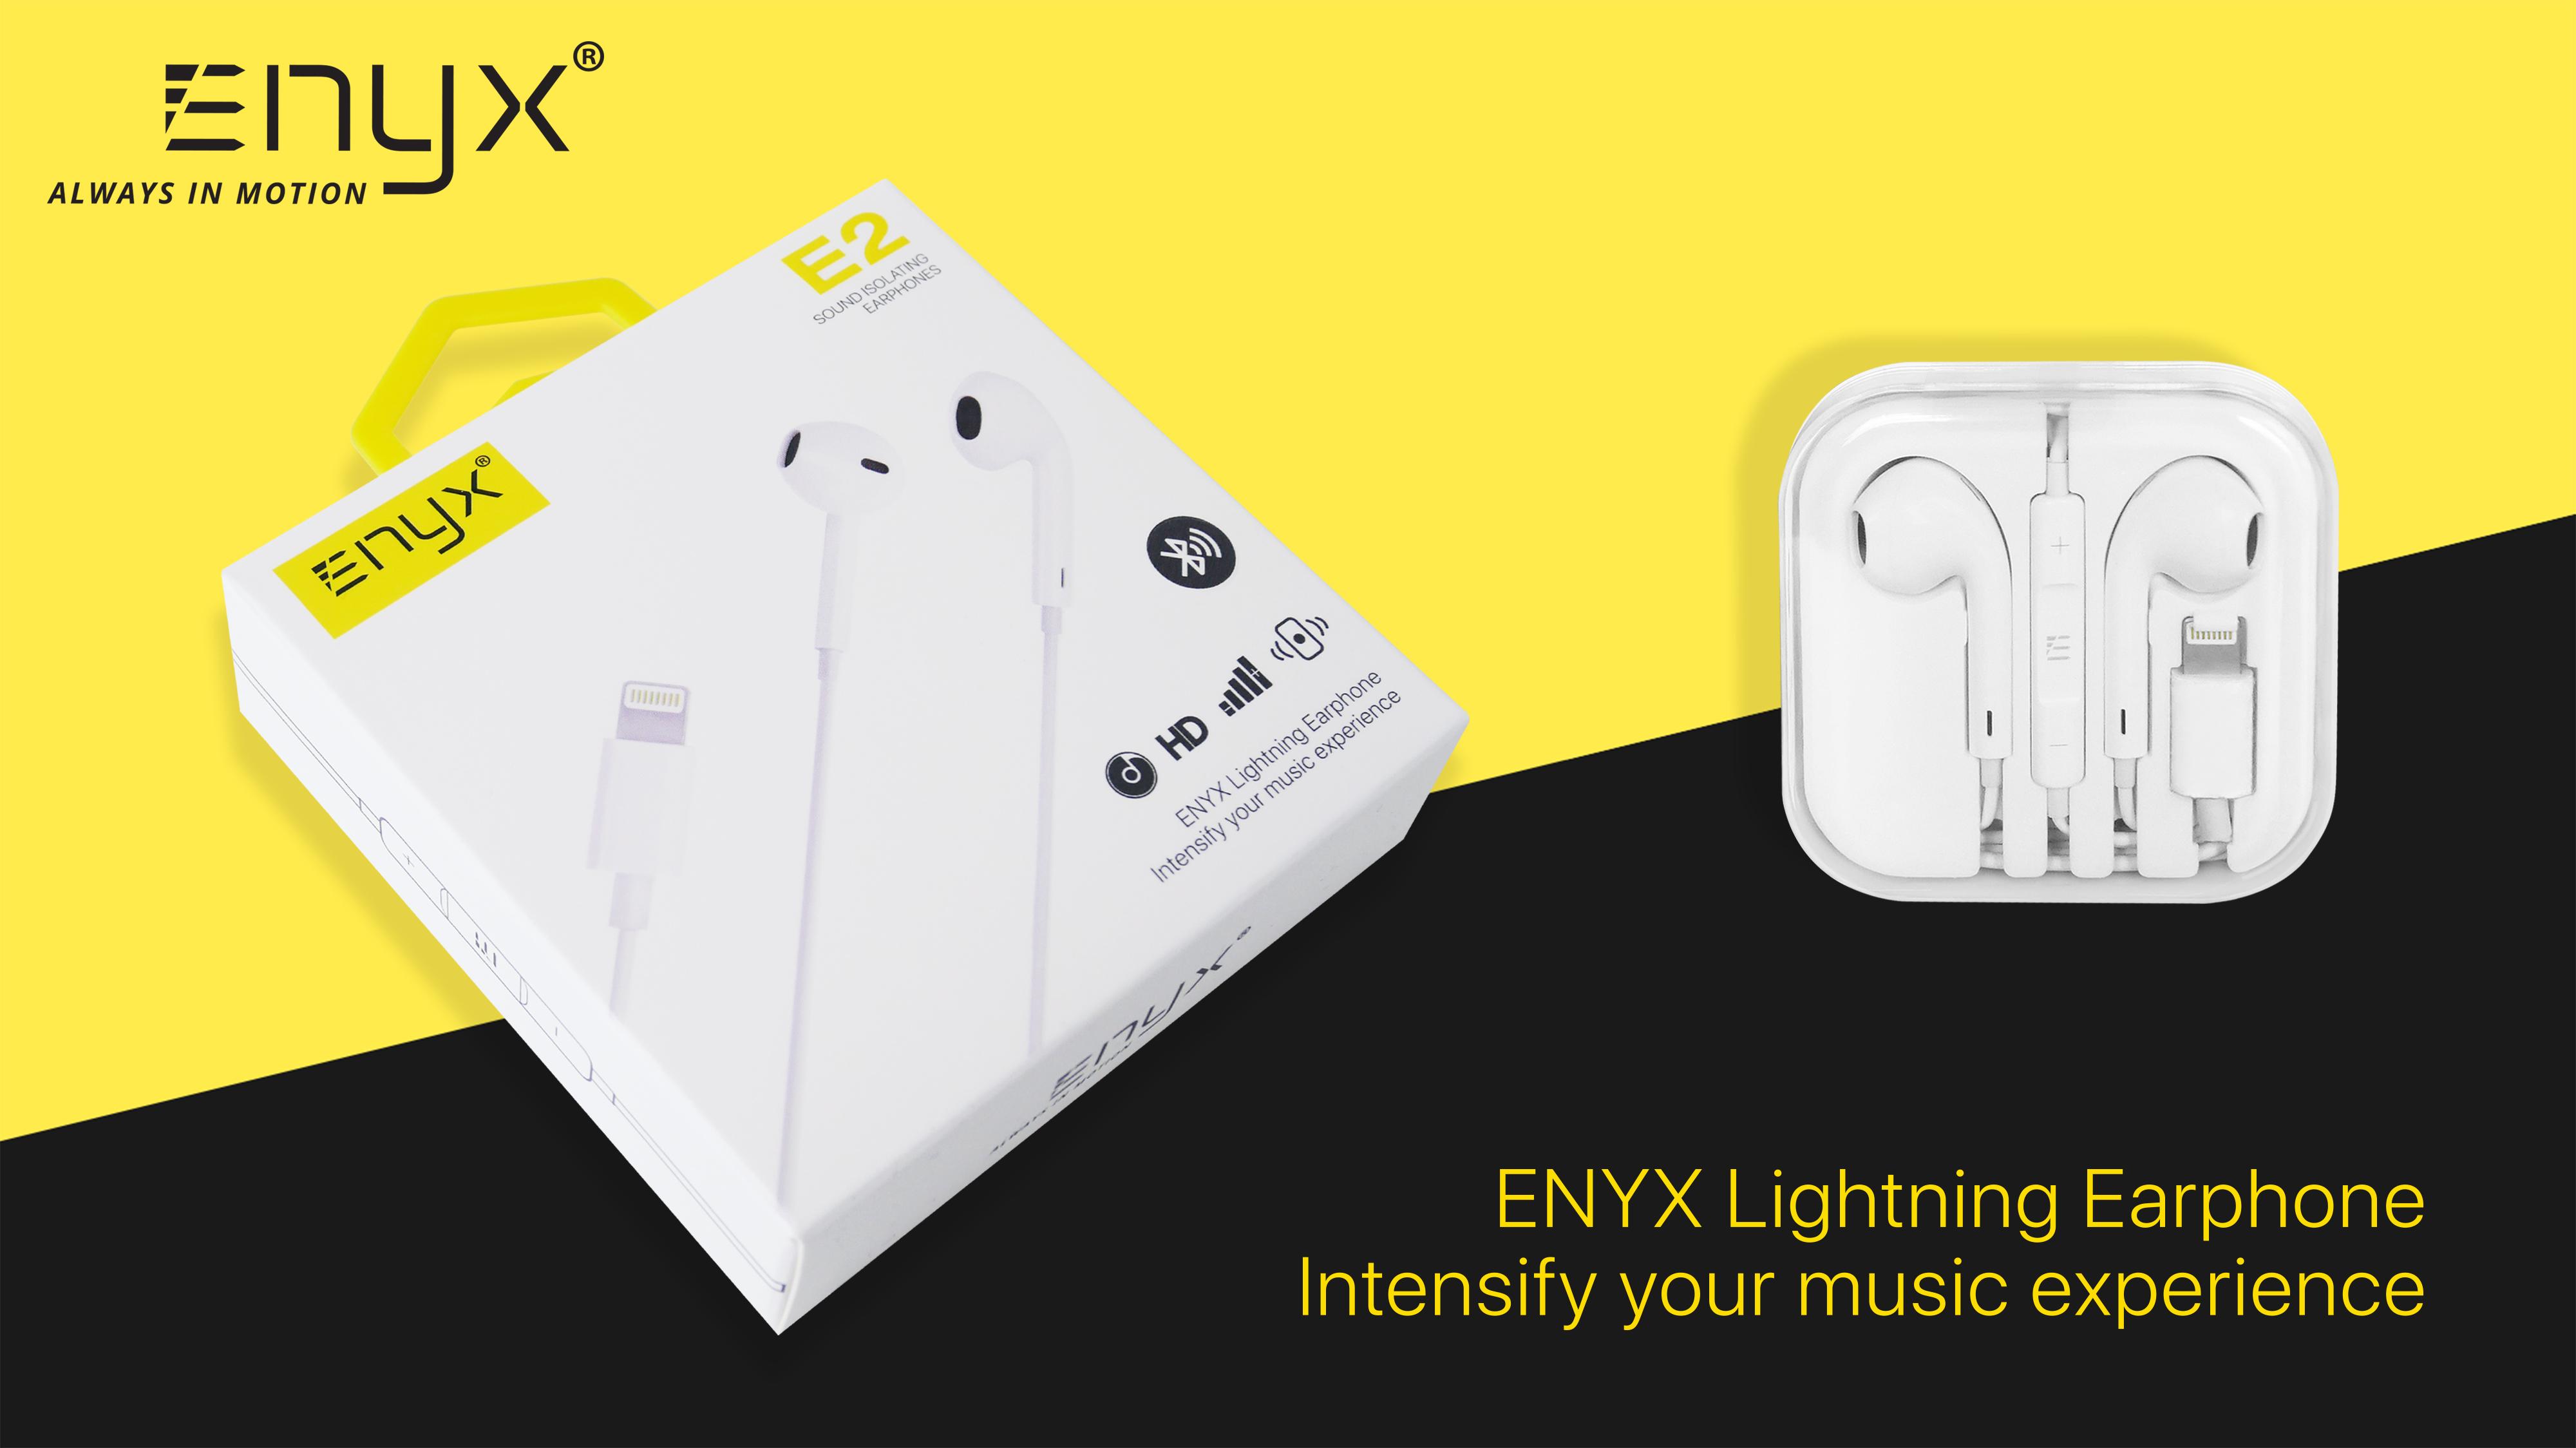 EE02 หูฟัง Earphone อินิกซ์ Enyx